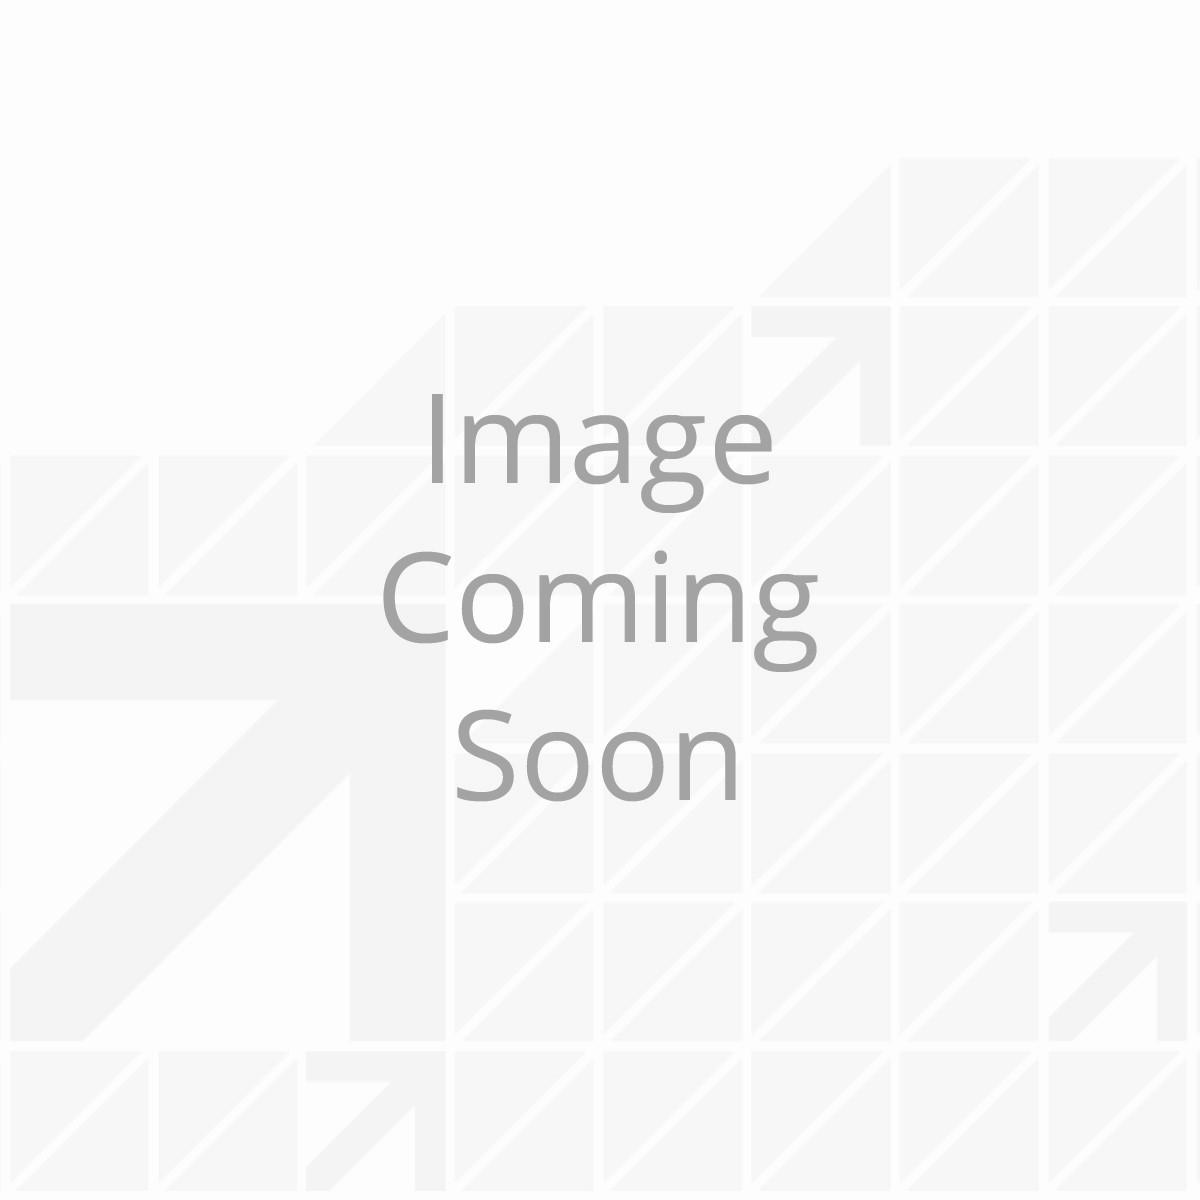 Solera® Grommet Diaphragm, 1.625 ID X 1.929 OD, Black, For Manual Crank Hole